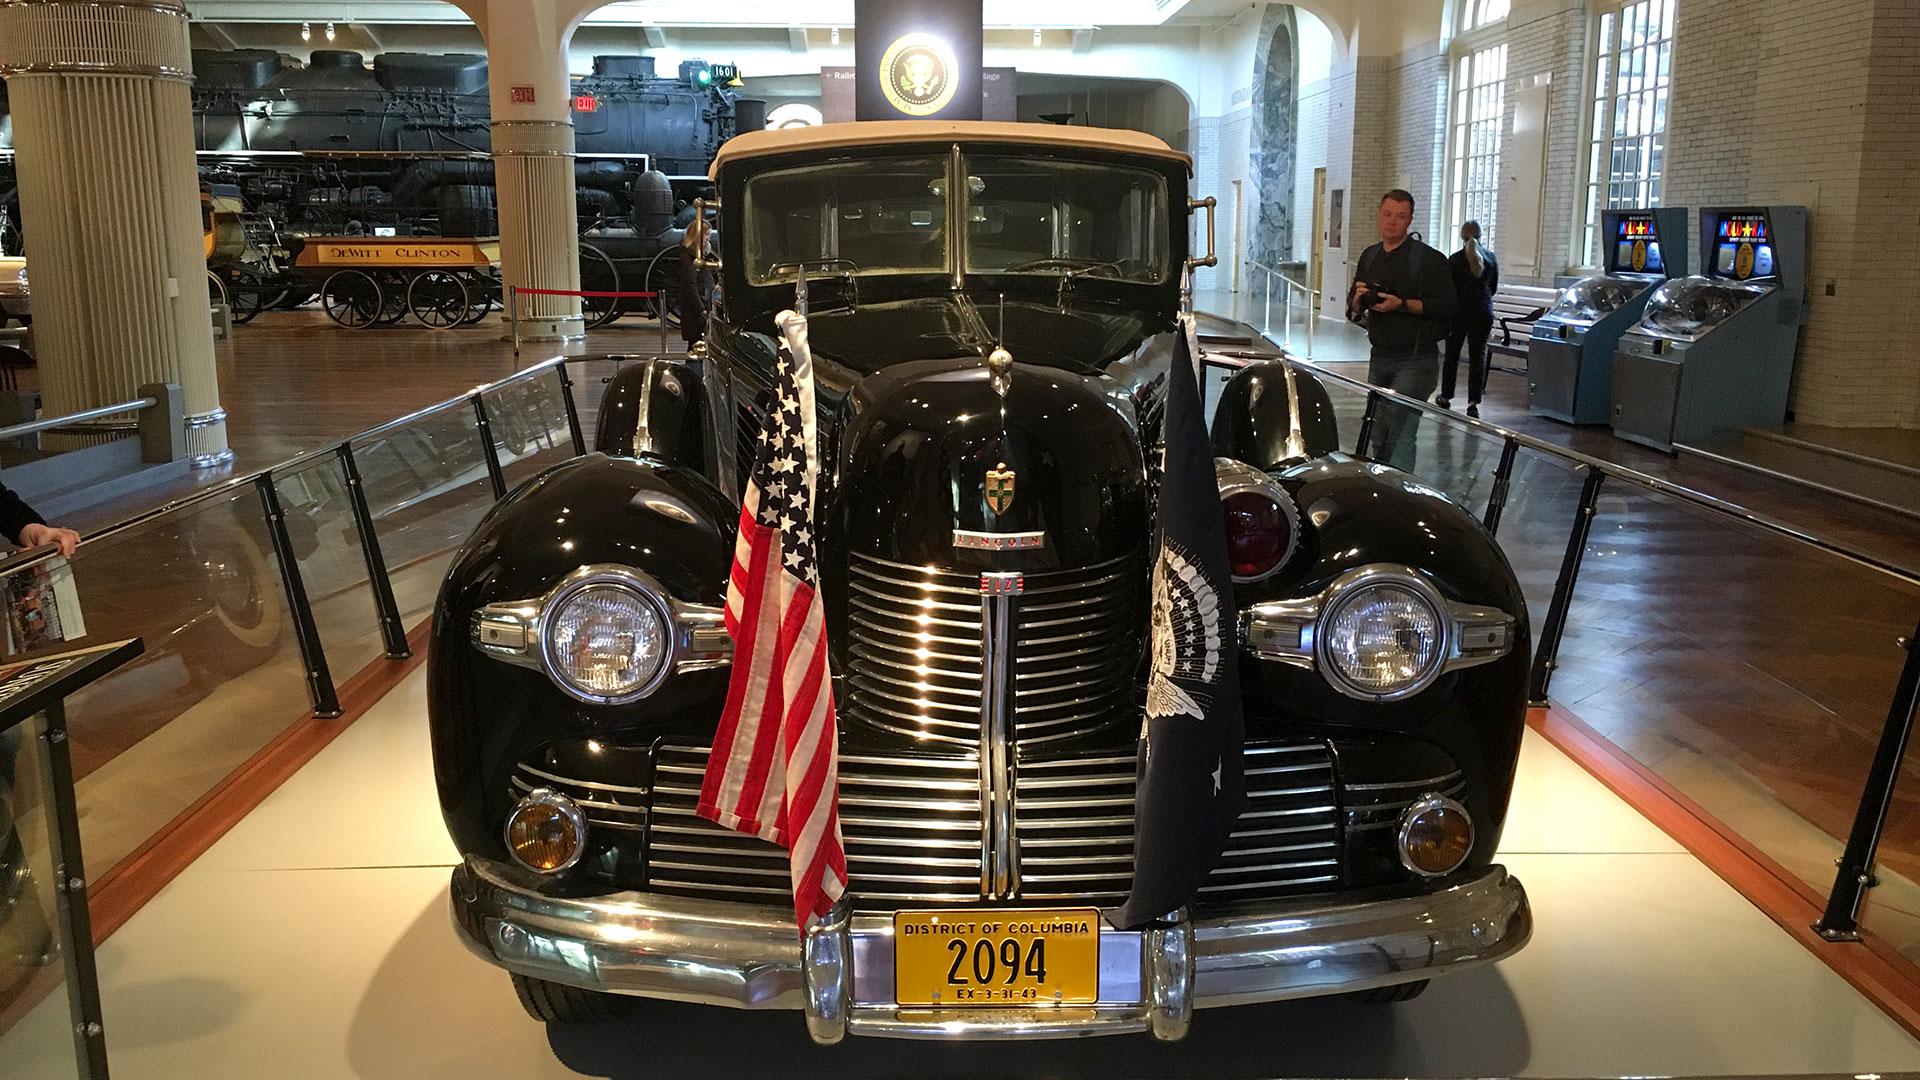 Sunshine Special, el Lincoln elegido por Franklin D. Roosevelt en 1939 (Infobae)